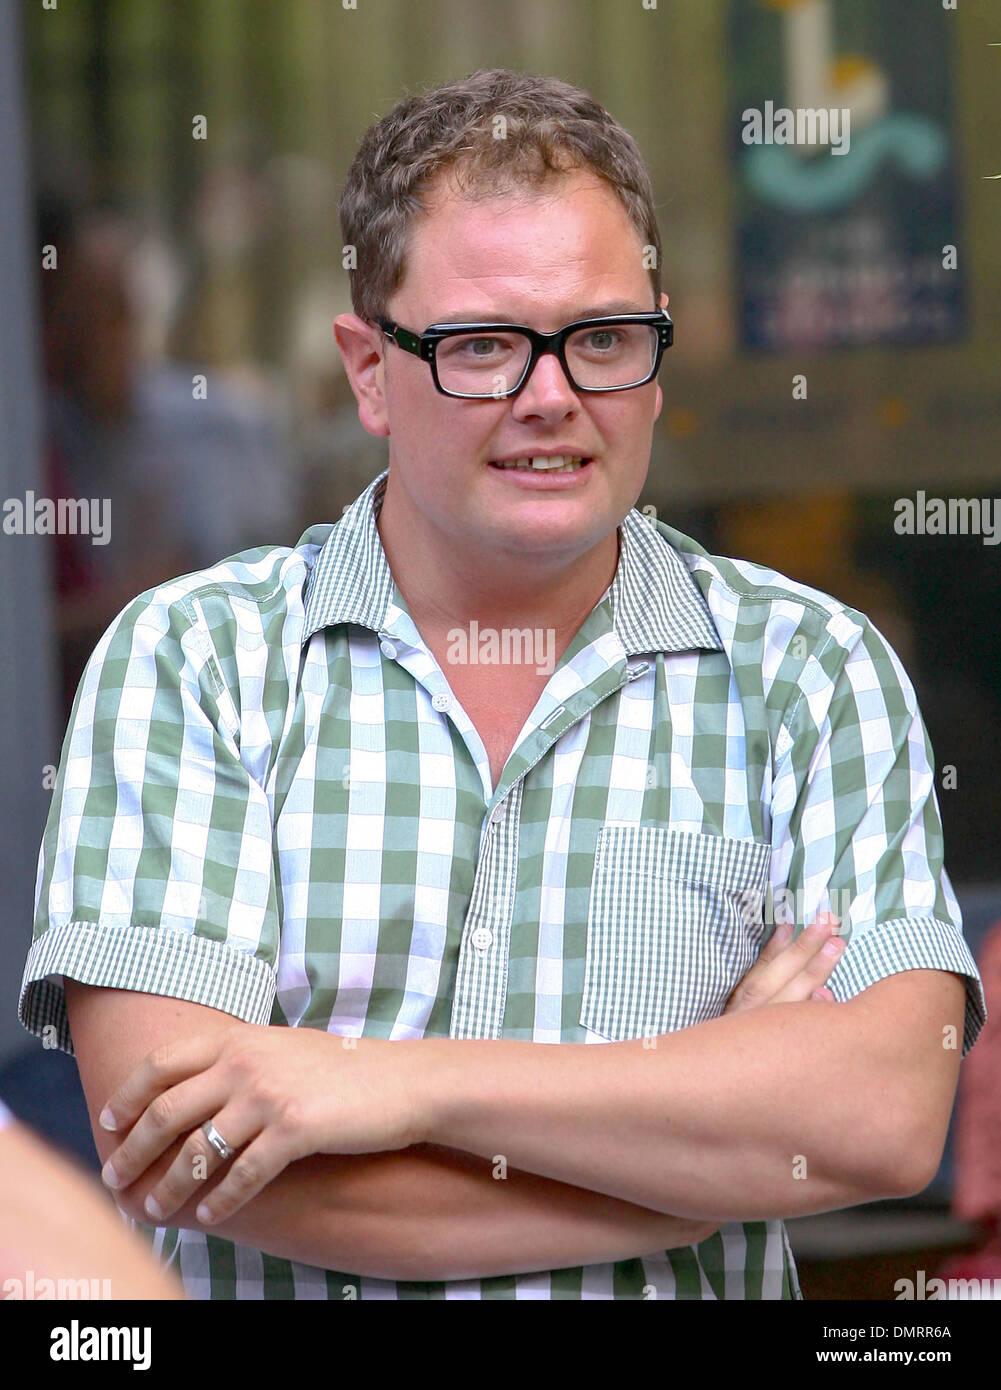 Alan Carr fuera de ITV Studios en manga corta camiseta marcada Londres, Inglaterra - 14.08.12 Imagen De Stock